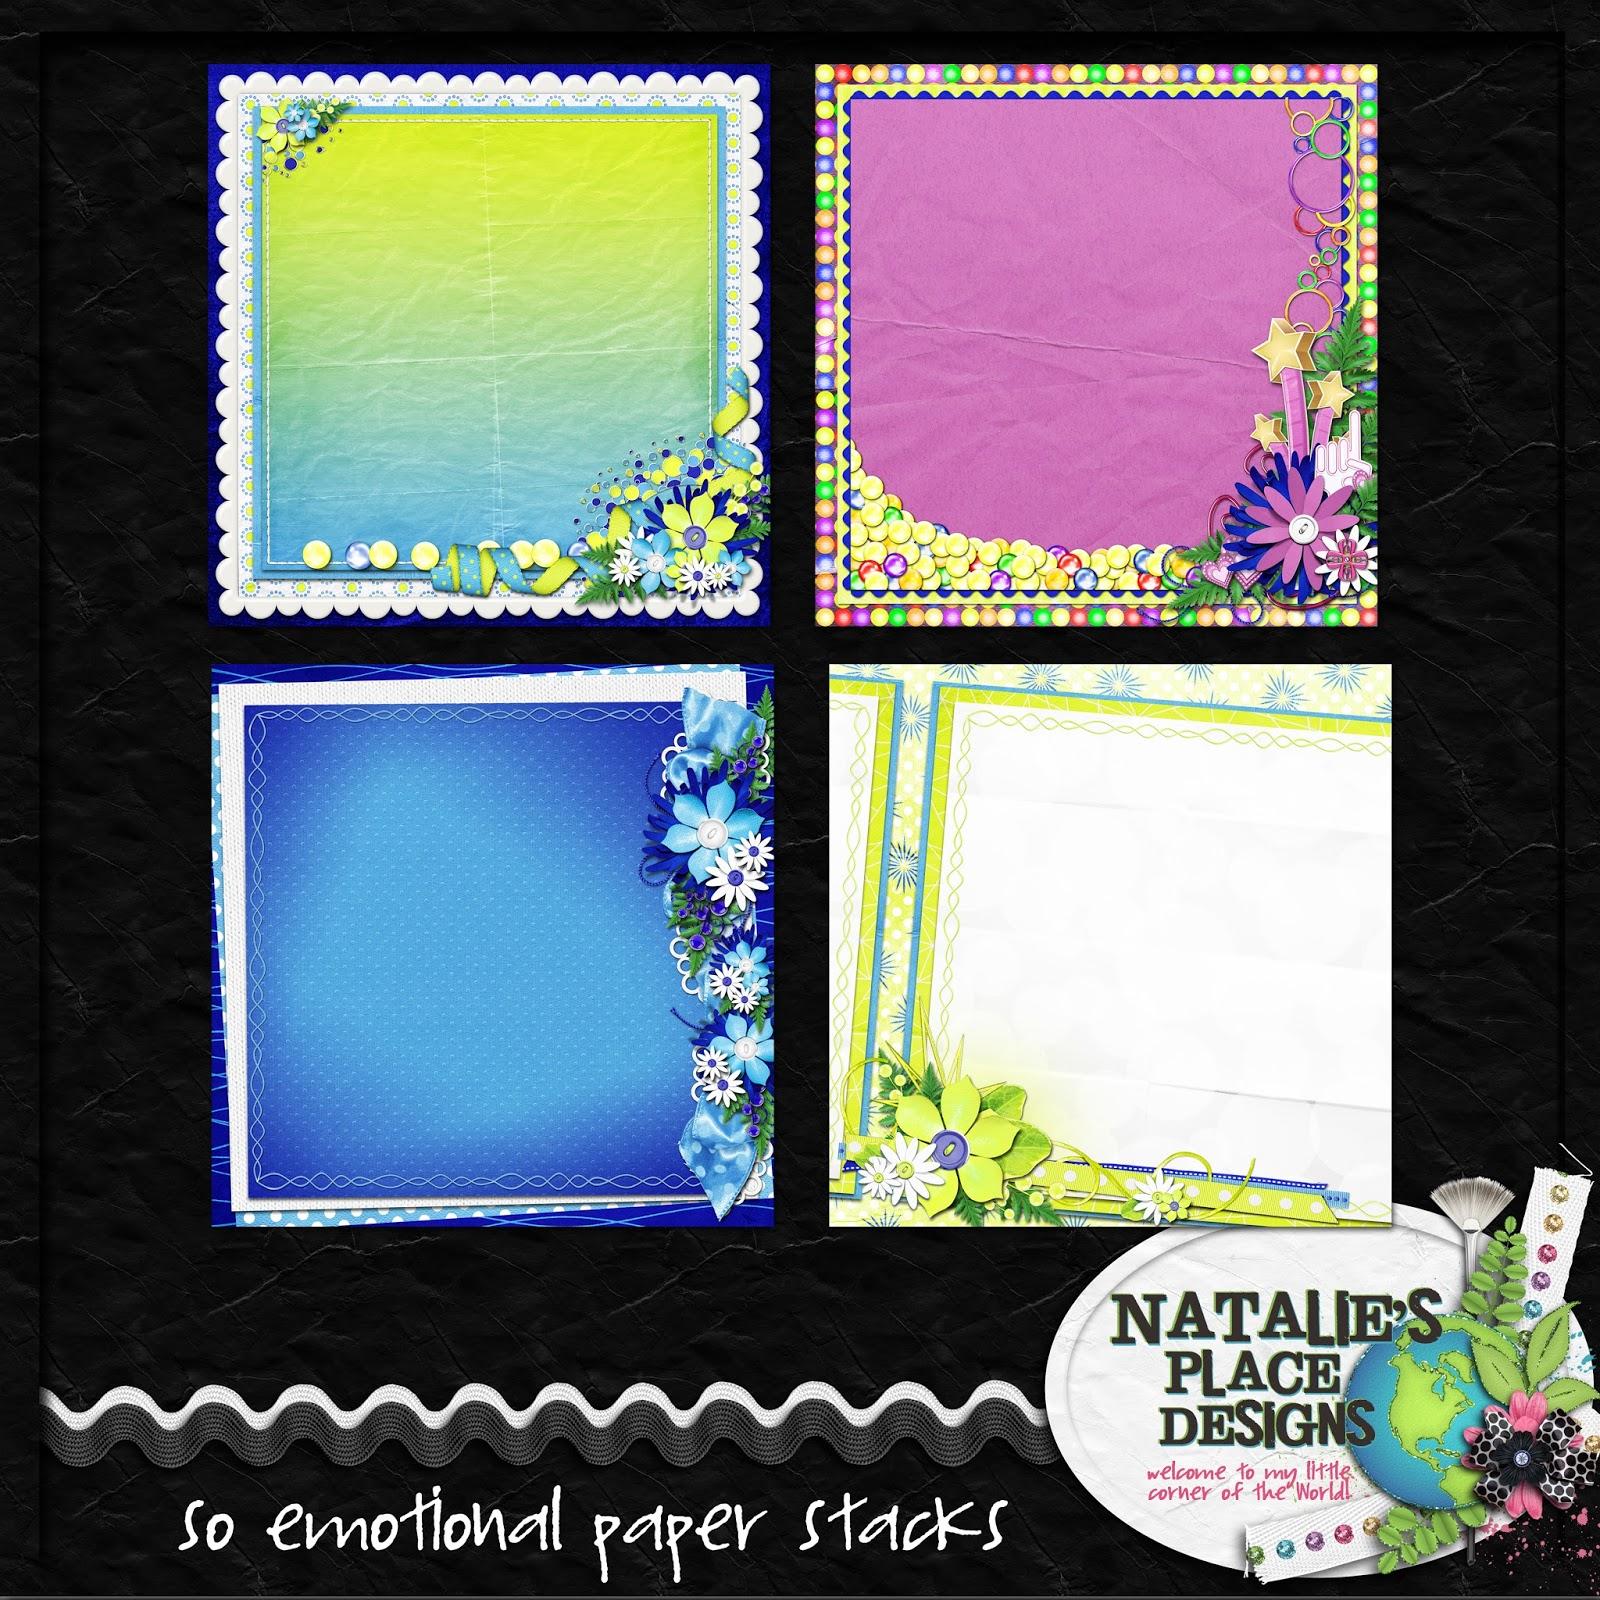 natalie designs scrapbook